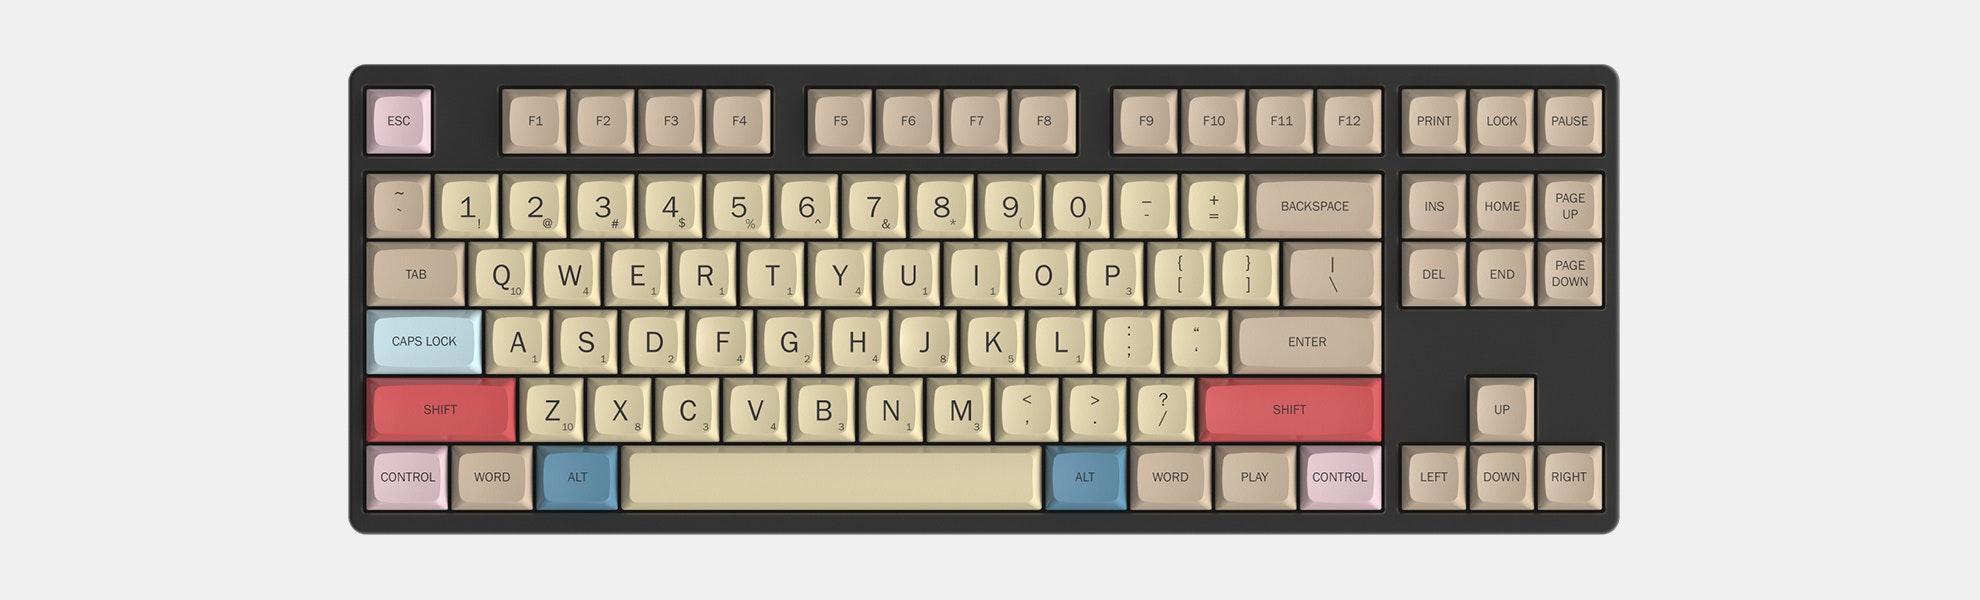 Massdrop x Hasbro Scrabble Mechanical Keyboard